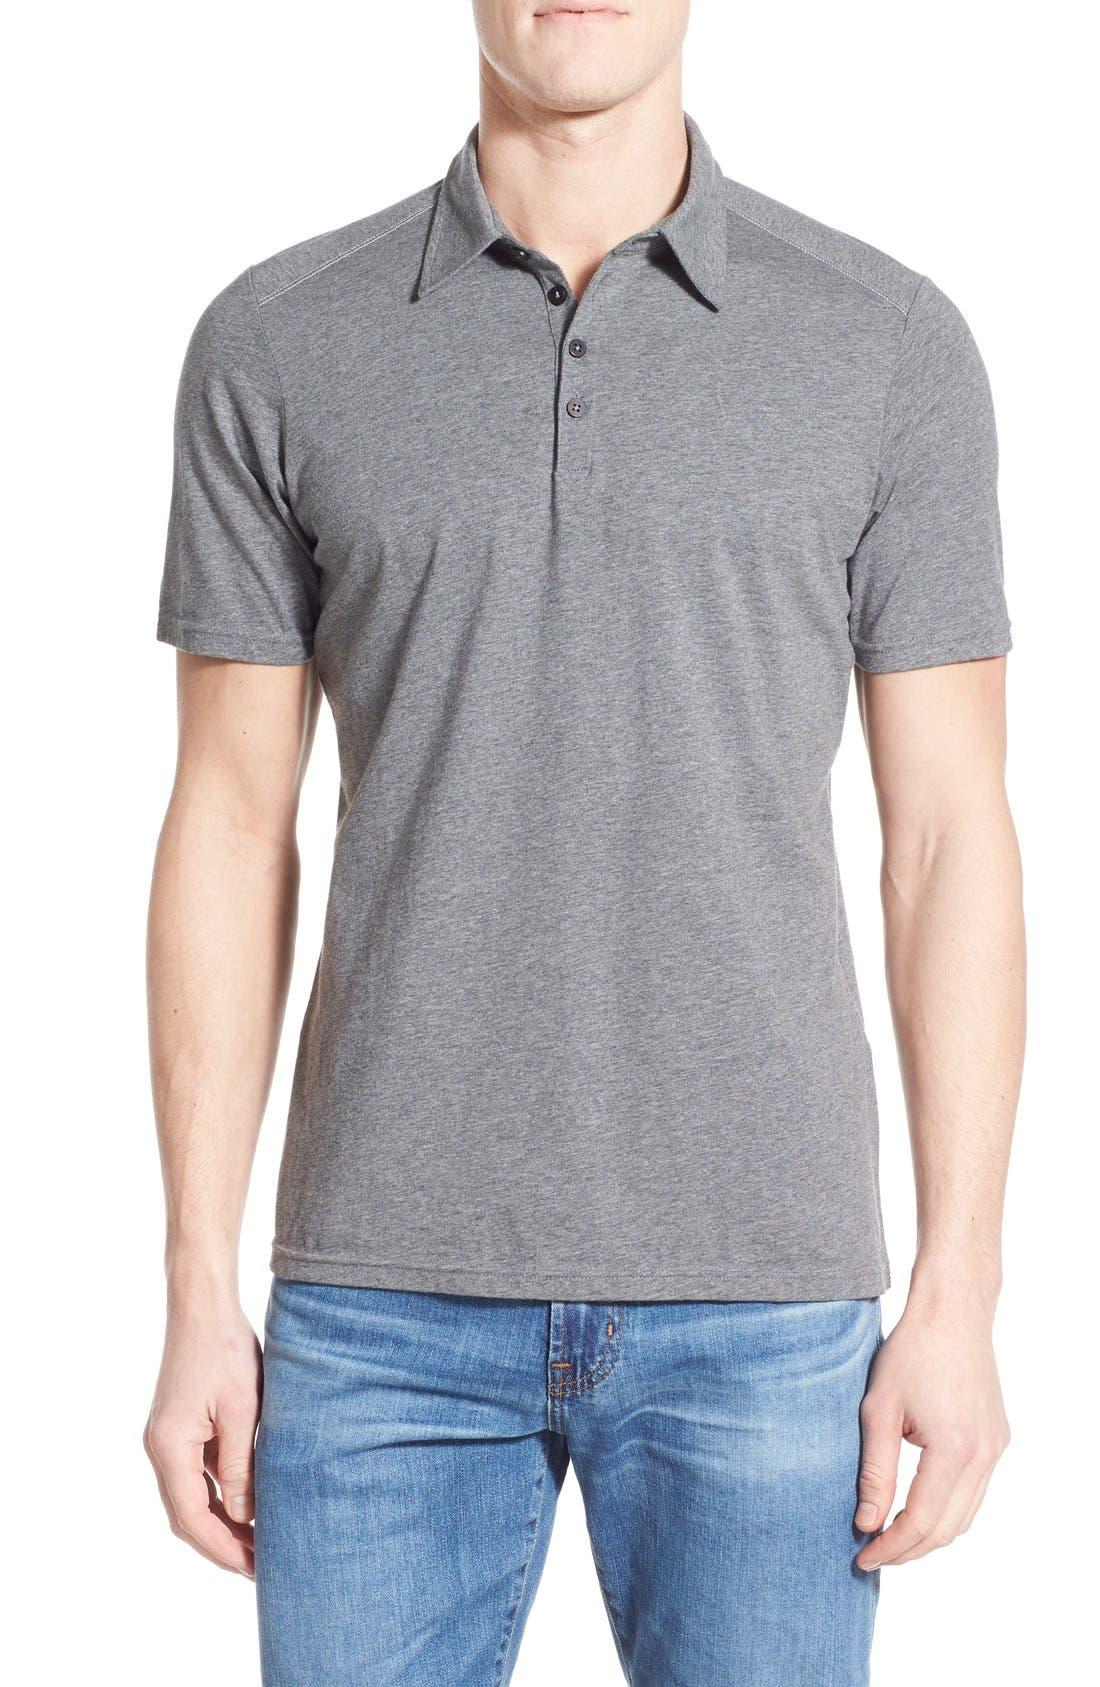 Nau Genus Stripe Jersey Pocket Polo